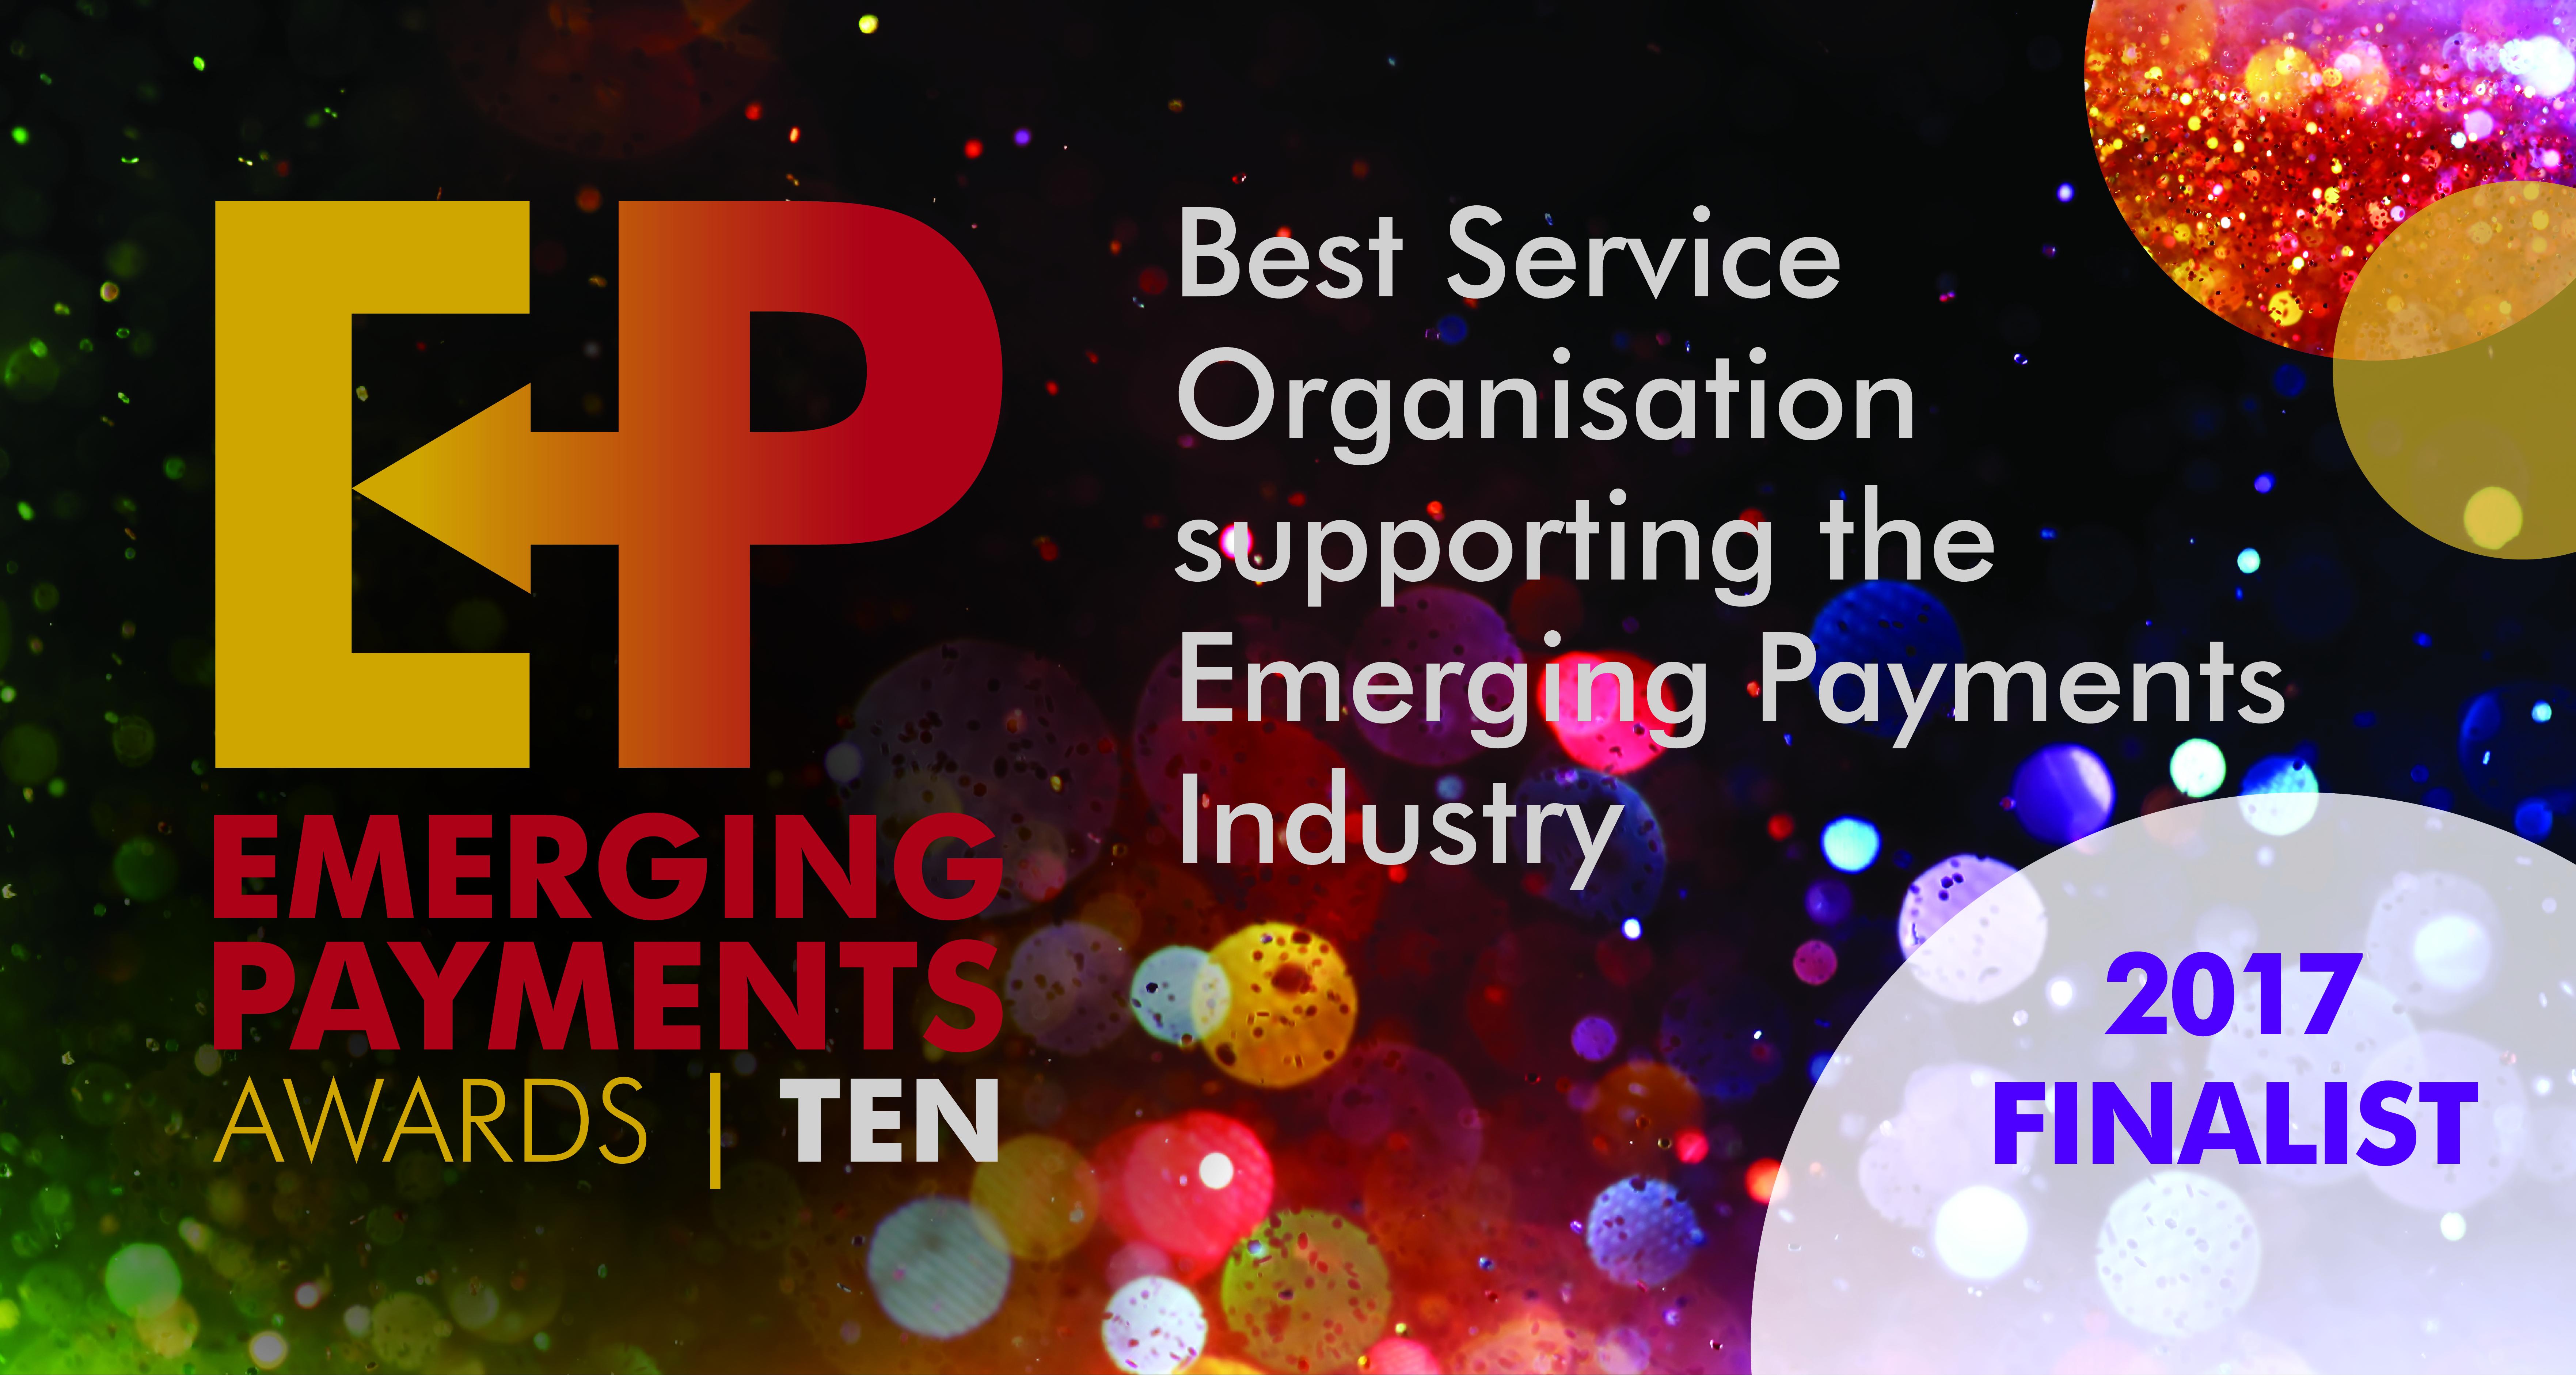 EPA 0153 Awards Finalist Best Service Organisation (002).jpg